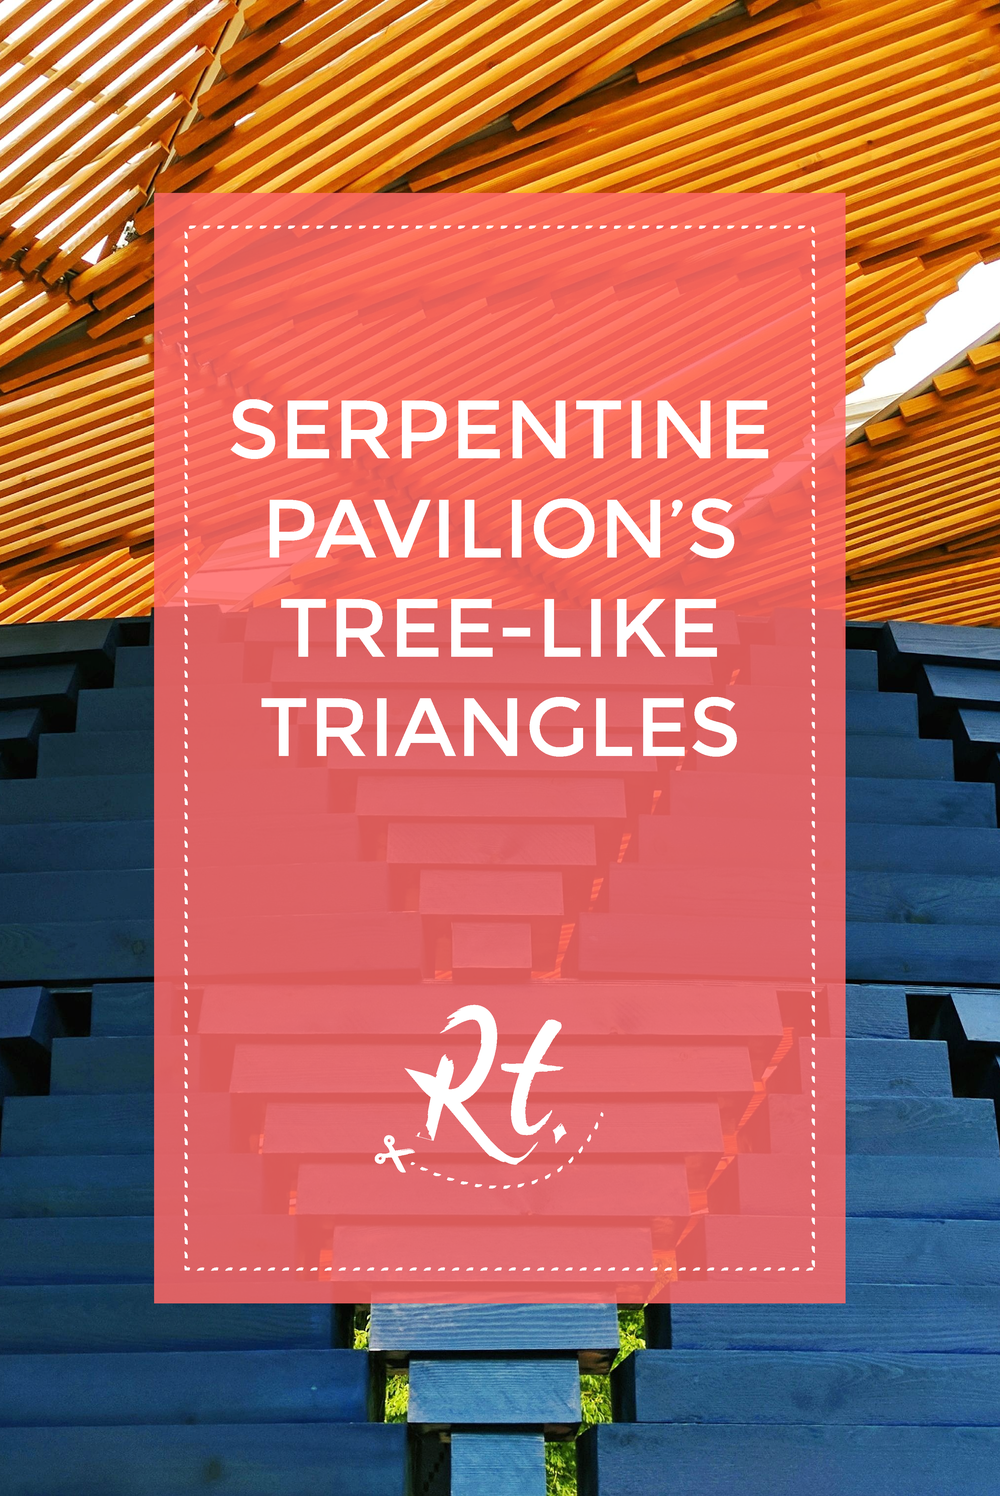 Serpentine Pavilion's Tree-Like Triangles by Rosh Thanki, Francis Kéré's indigo blue tree canopy at serpentine gallery